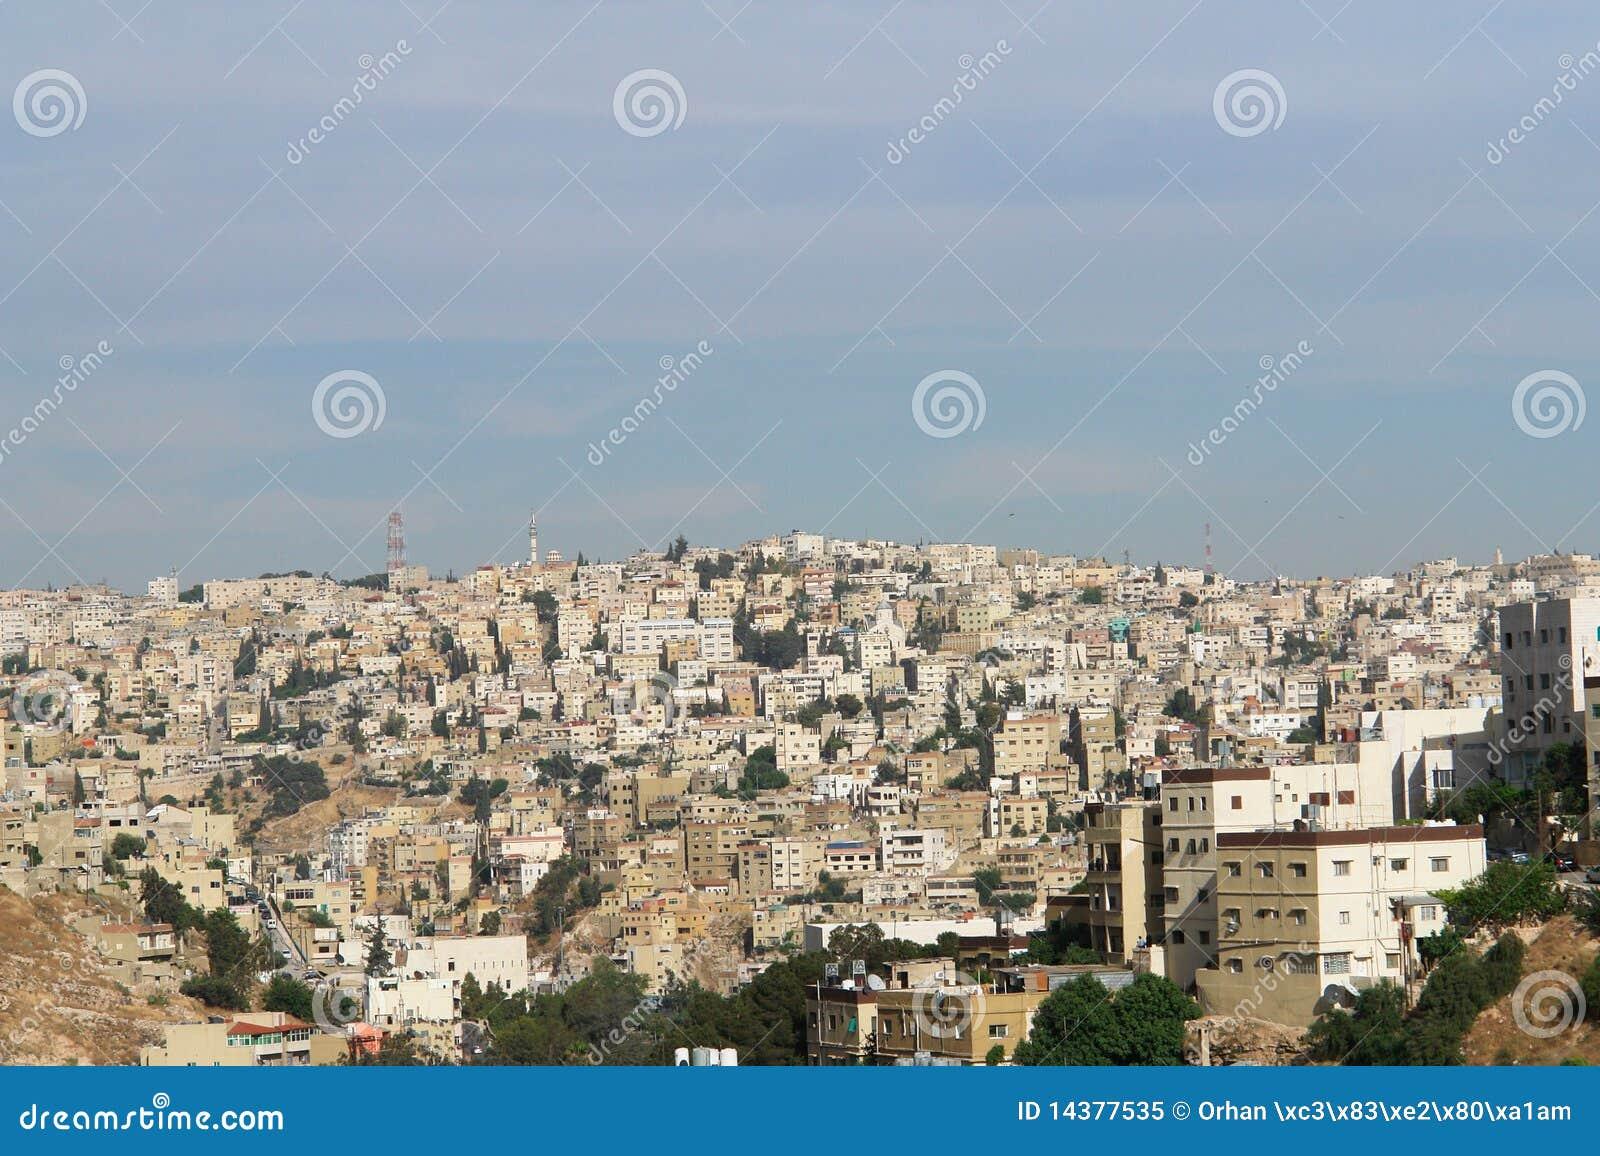 Amman, Jordanie - paysage urbain